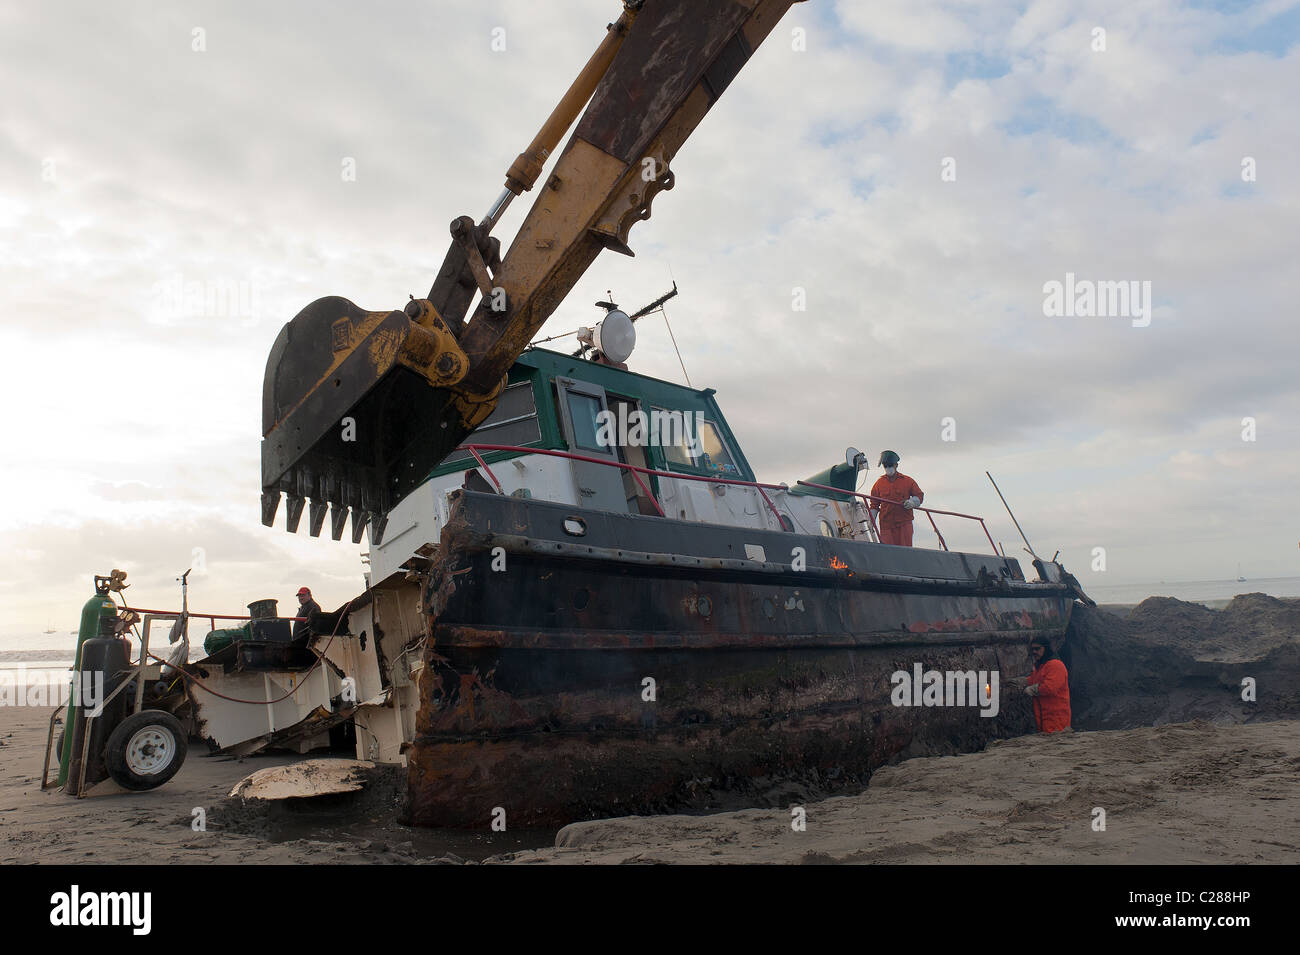 Beached tug boat after a storm, Santa Barbara, East Beach - Stock Image